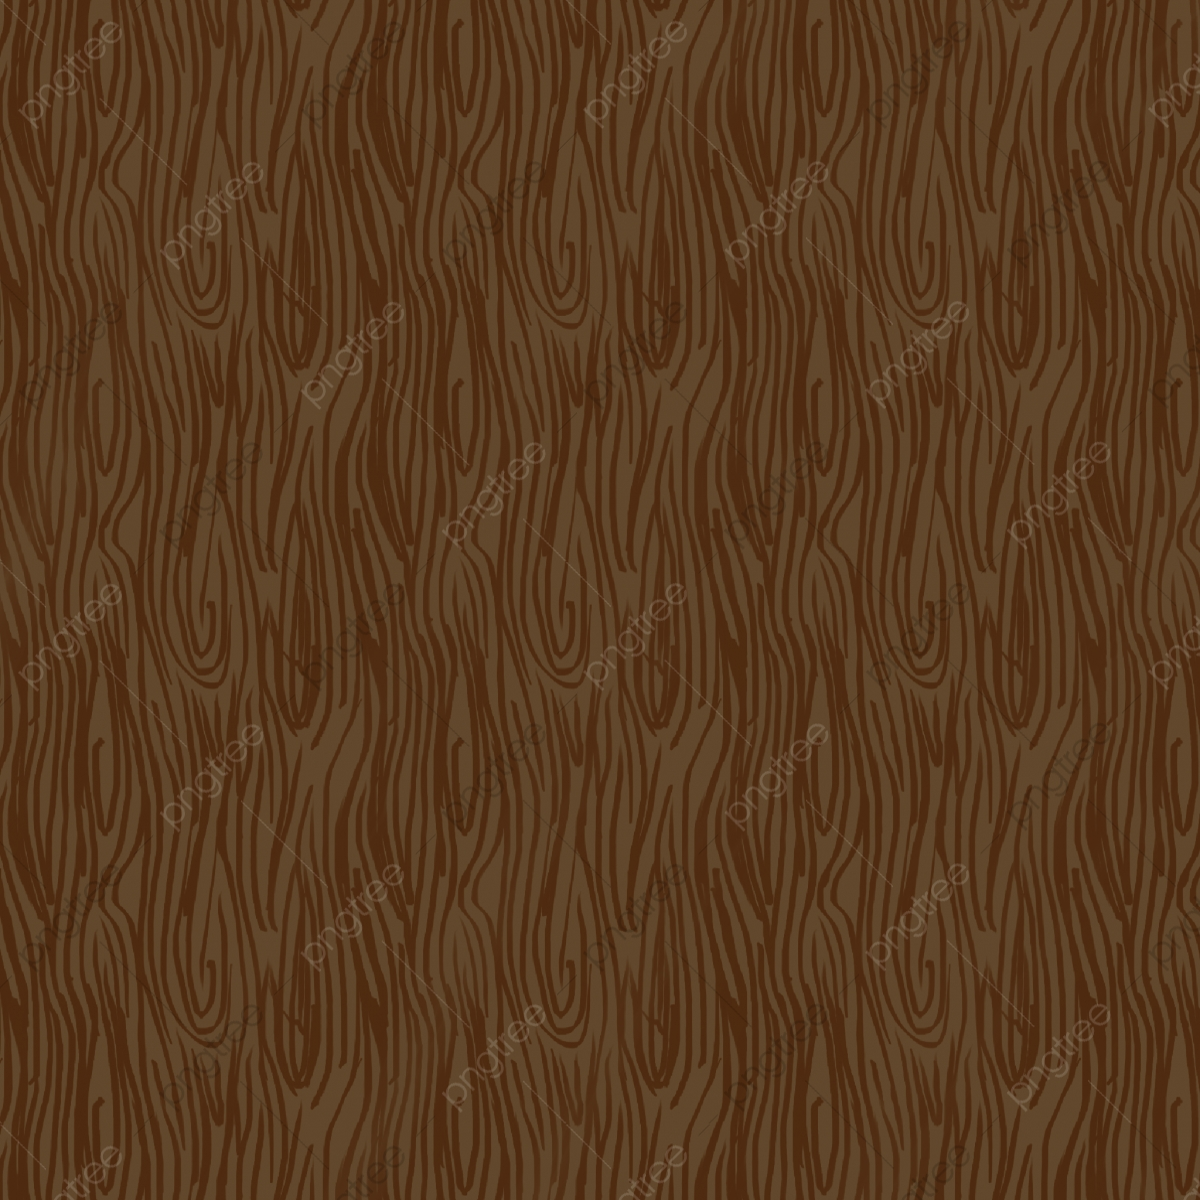 Wood Plank Wood Grain Texture Brown Cartoon Stick Figure Simple Hook Line Free Buckle, Plank ...